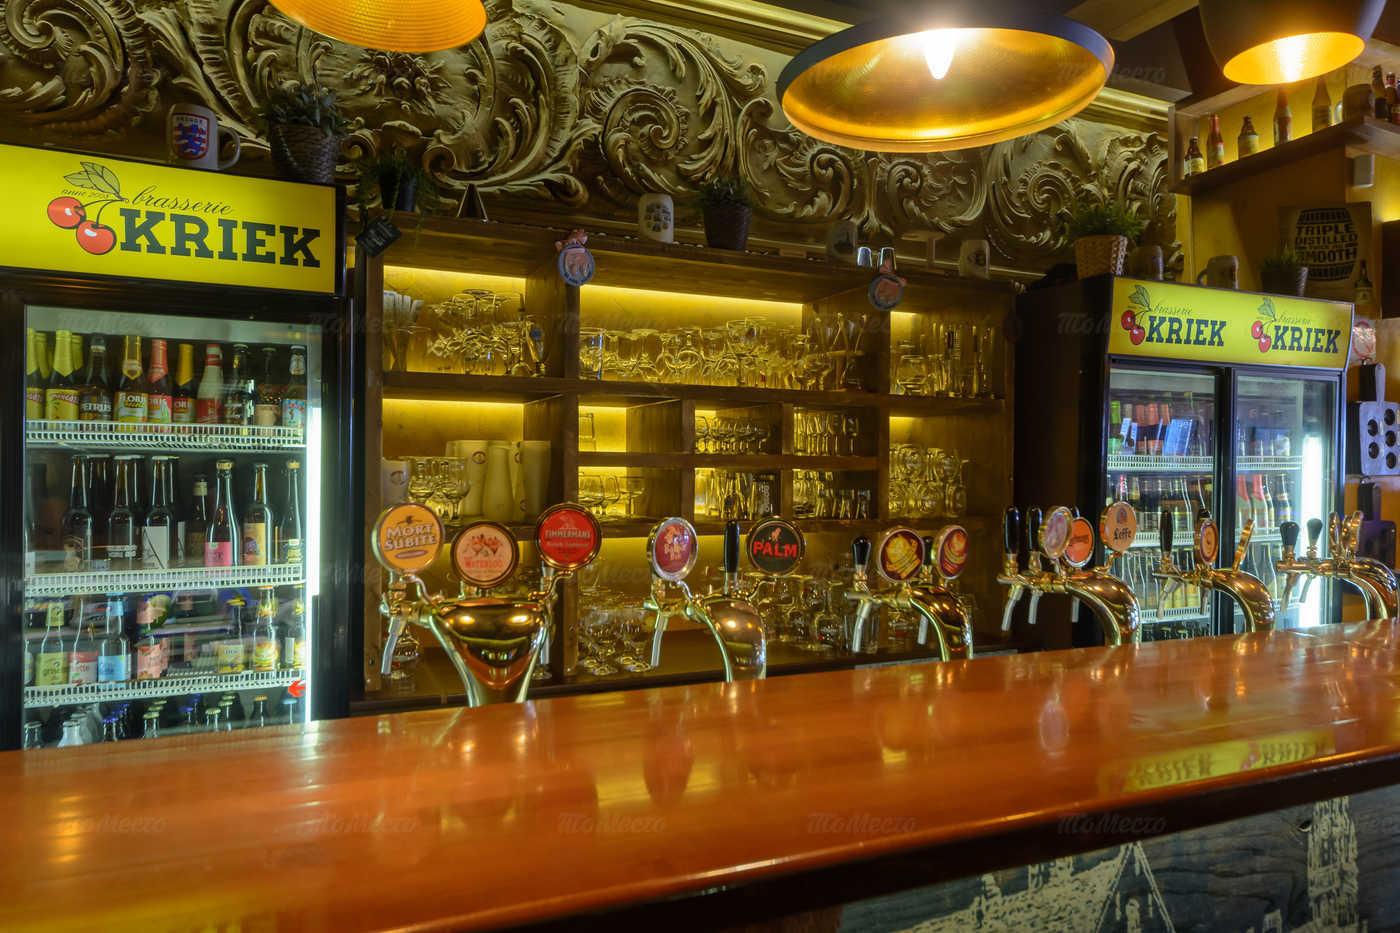 Ресторан Брассерия Крик (Brasserie Kriek) на Невском проспекте фото 6